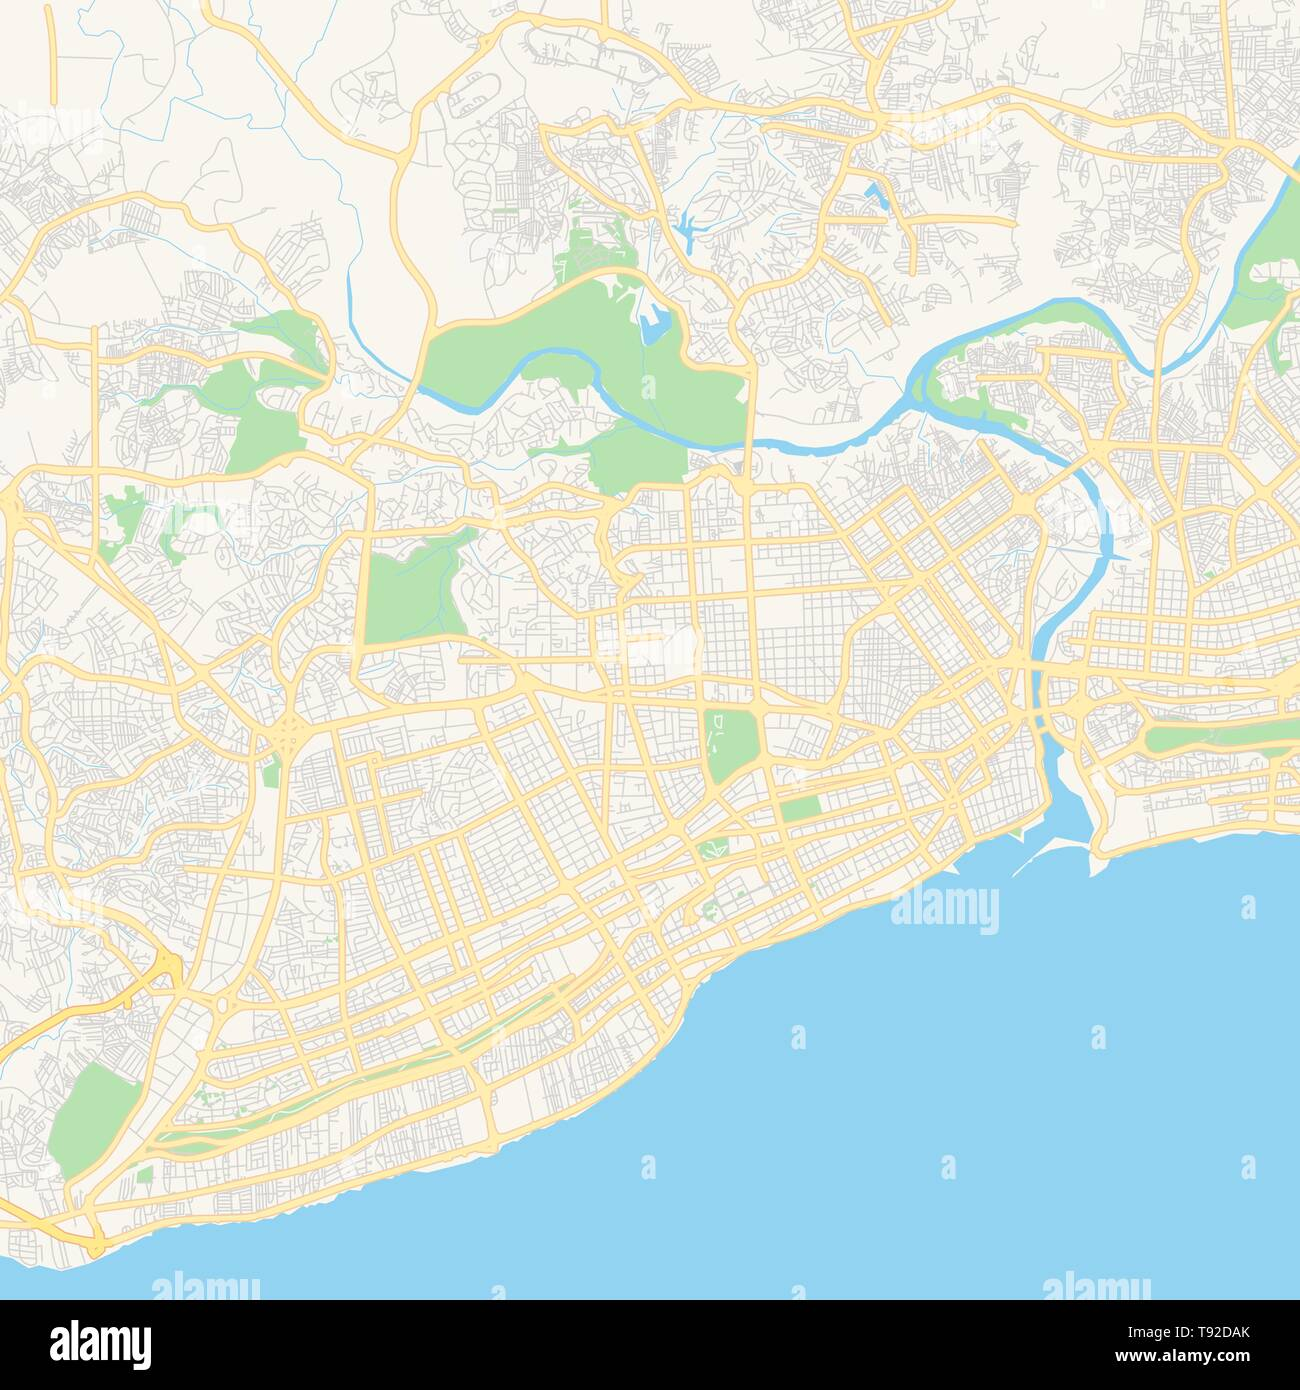 Empty vector map of Santo Domingo, Distrito Nacional ... on lyon world map, quito on world map, guayaquil world map, jeddah world map, managua on world map, brindisi world map, mazatlan world map, guatemala city world map, piraeus world map, strait of hormuz on world map, aqaba world map, izmir world map, yaounde world map, hispaniola world map, manhattan world map, surabaya world map, kingstown world map, bari world map, dominican republic world map, new spain world map,